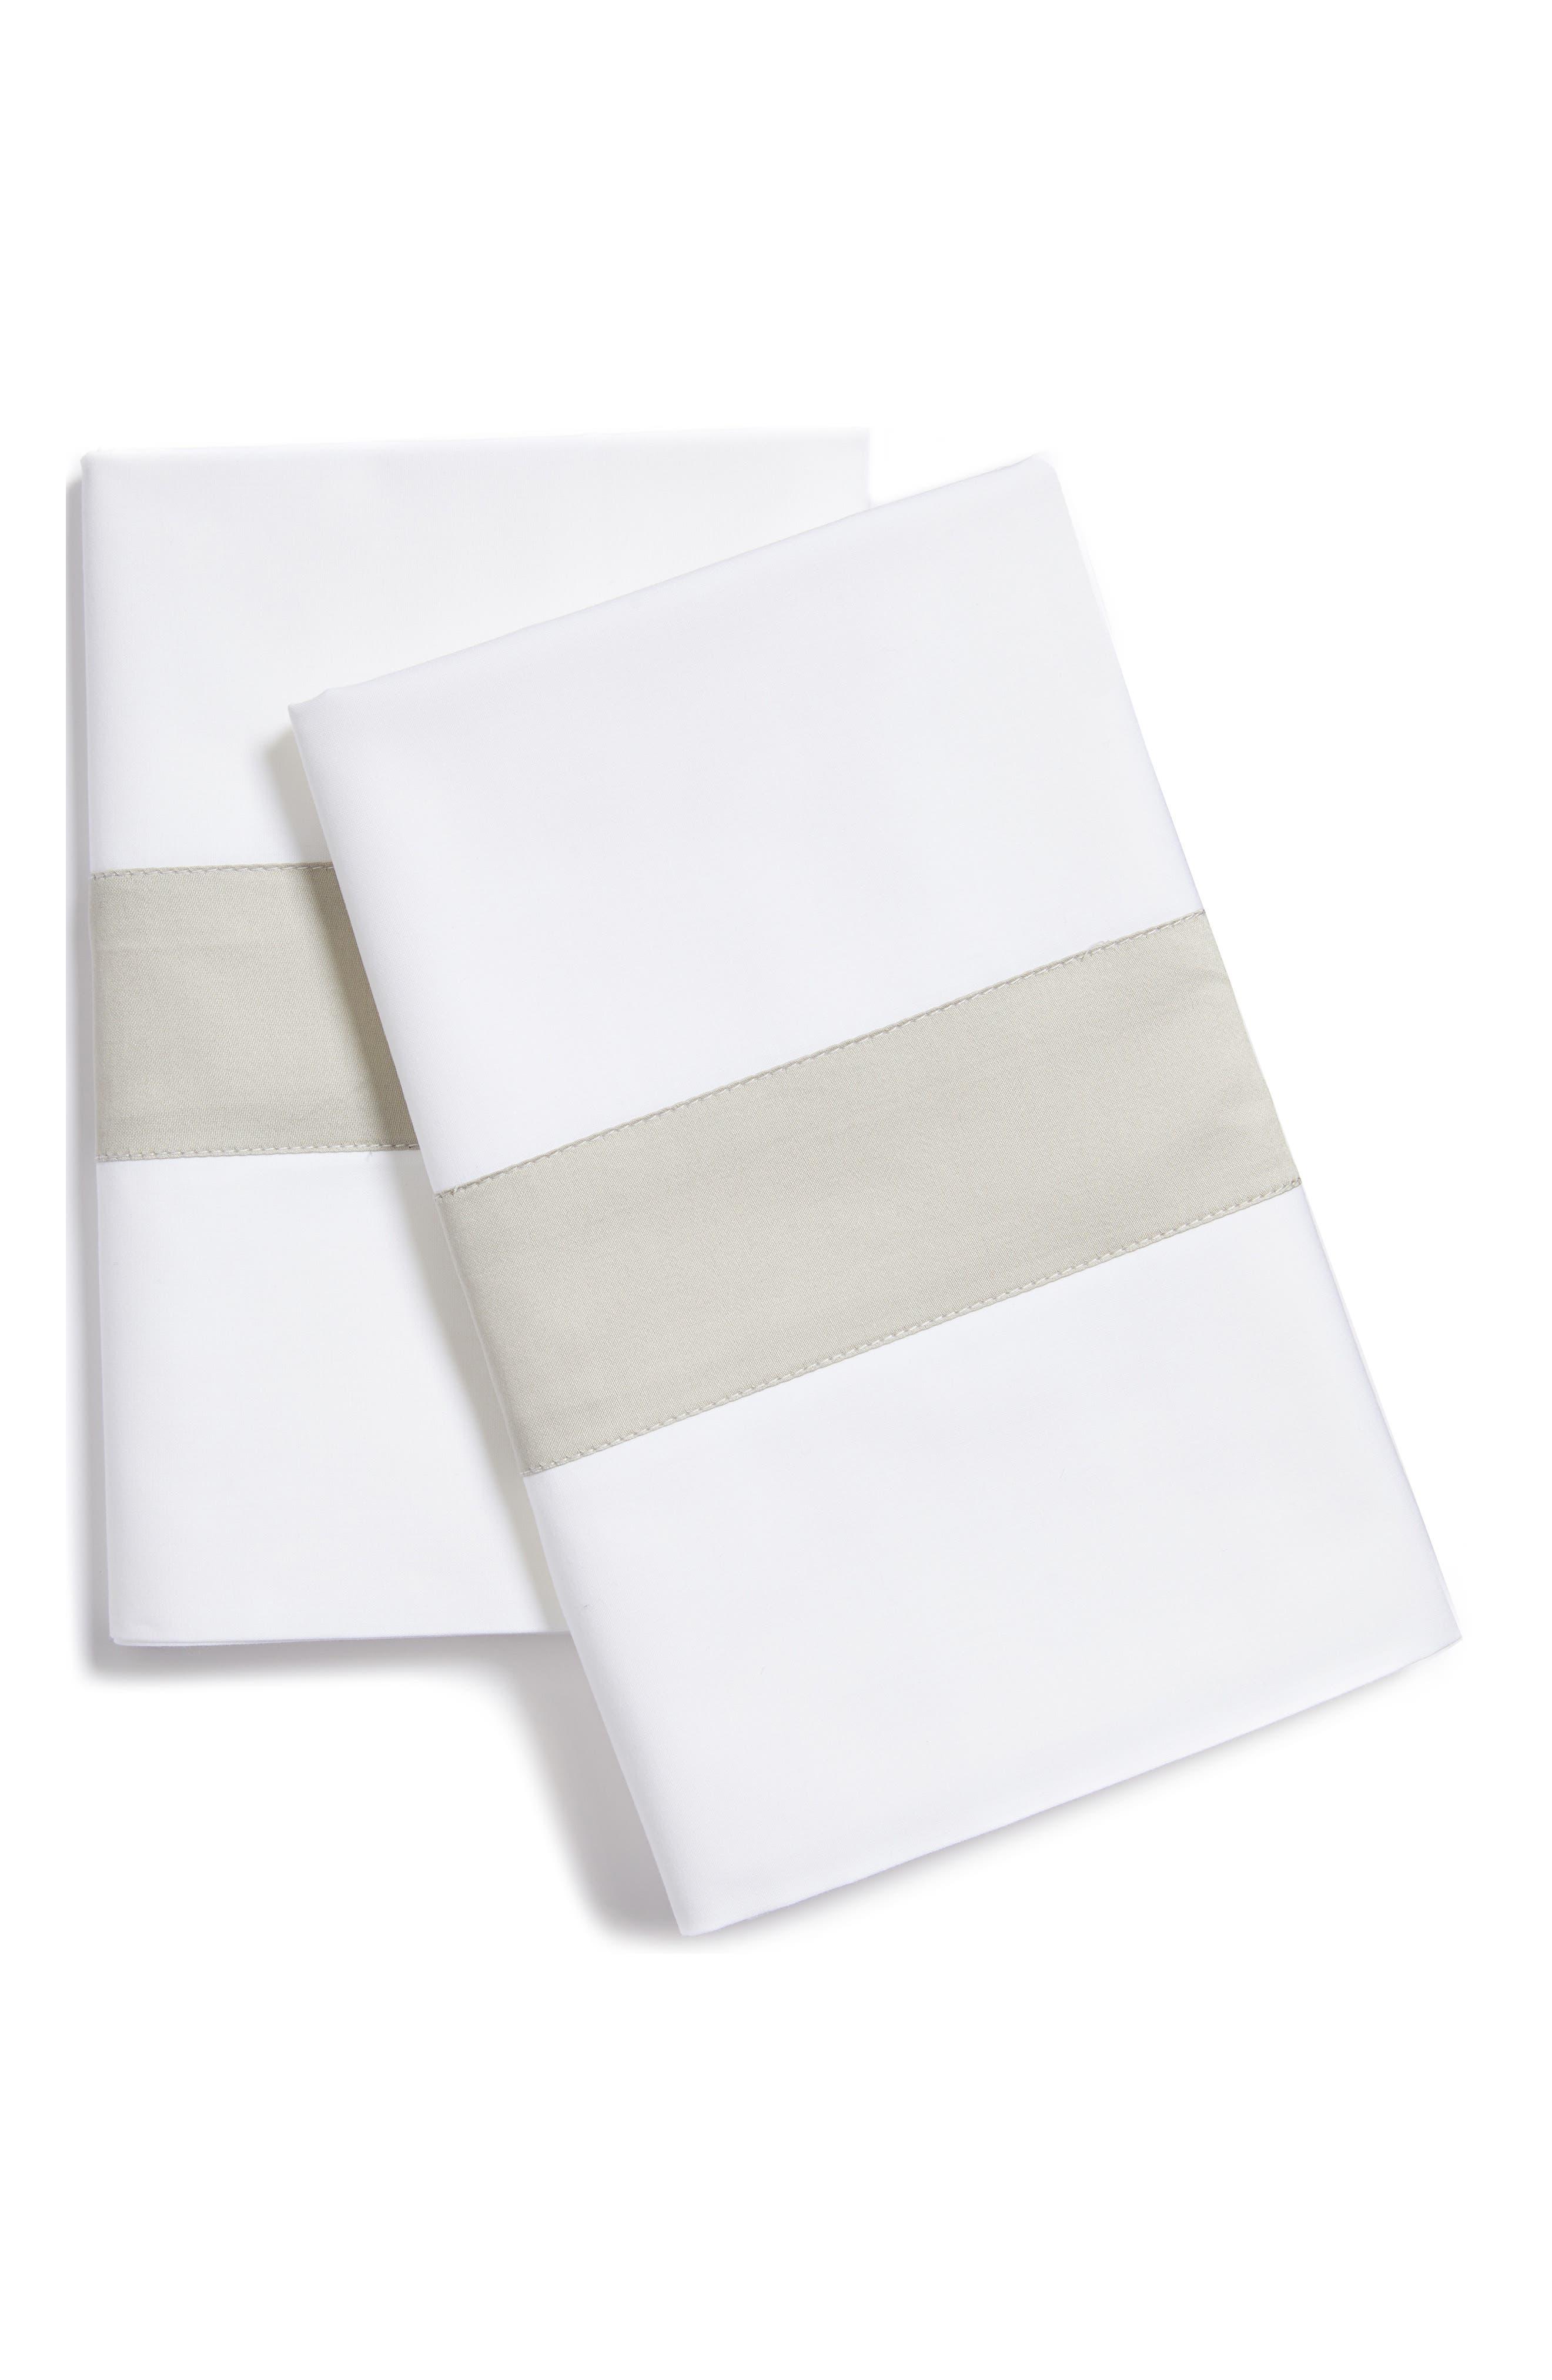 Orlo Pillowcase,                             Main thumbnail 1, color,                             020